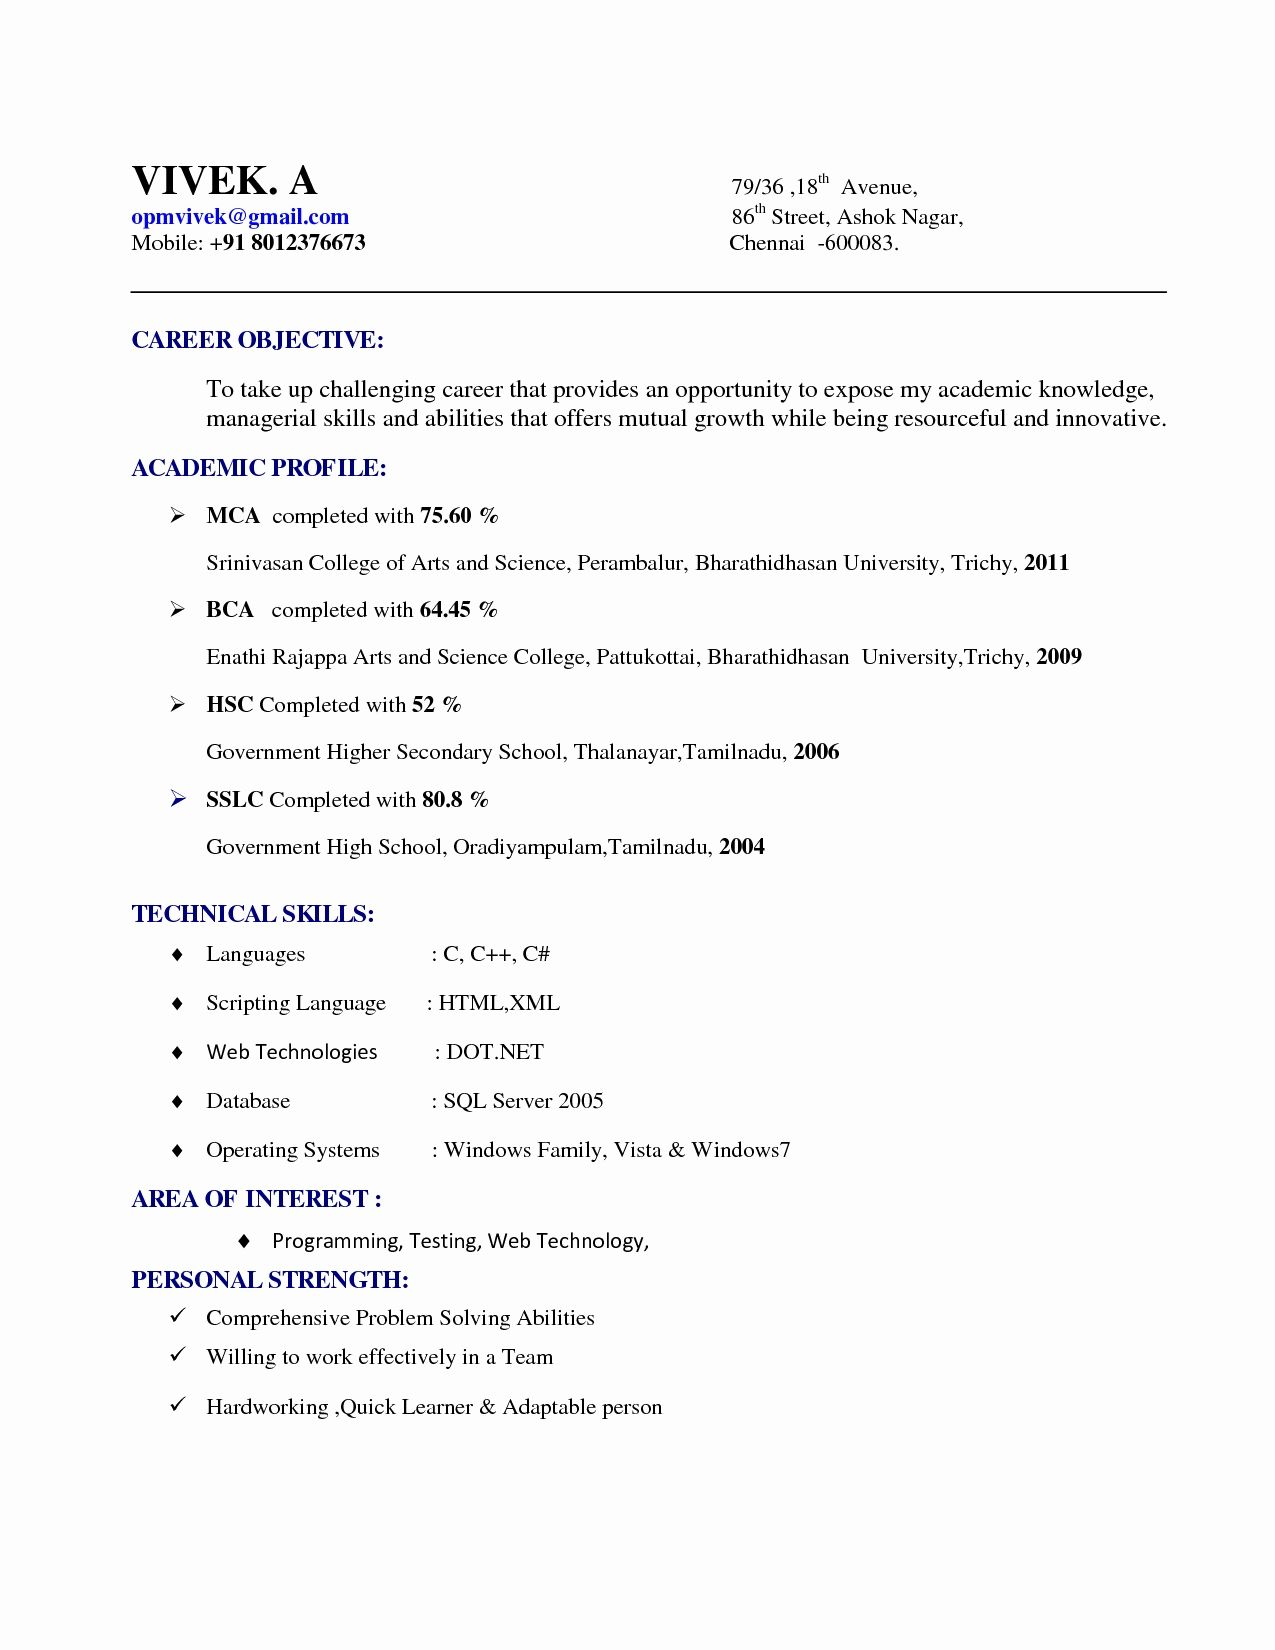 Resume Format India Resume Format Pinterest Resume Format